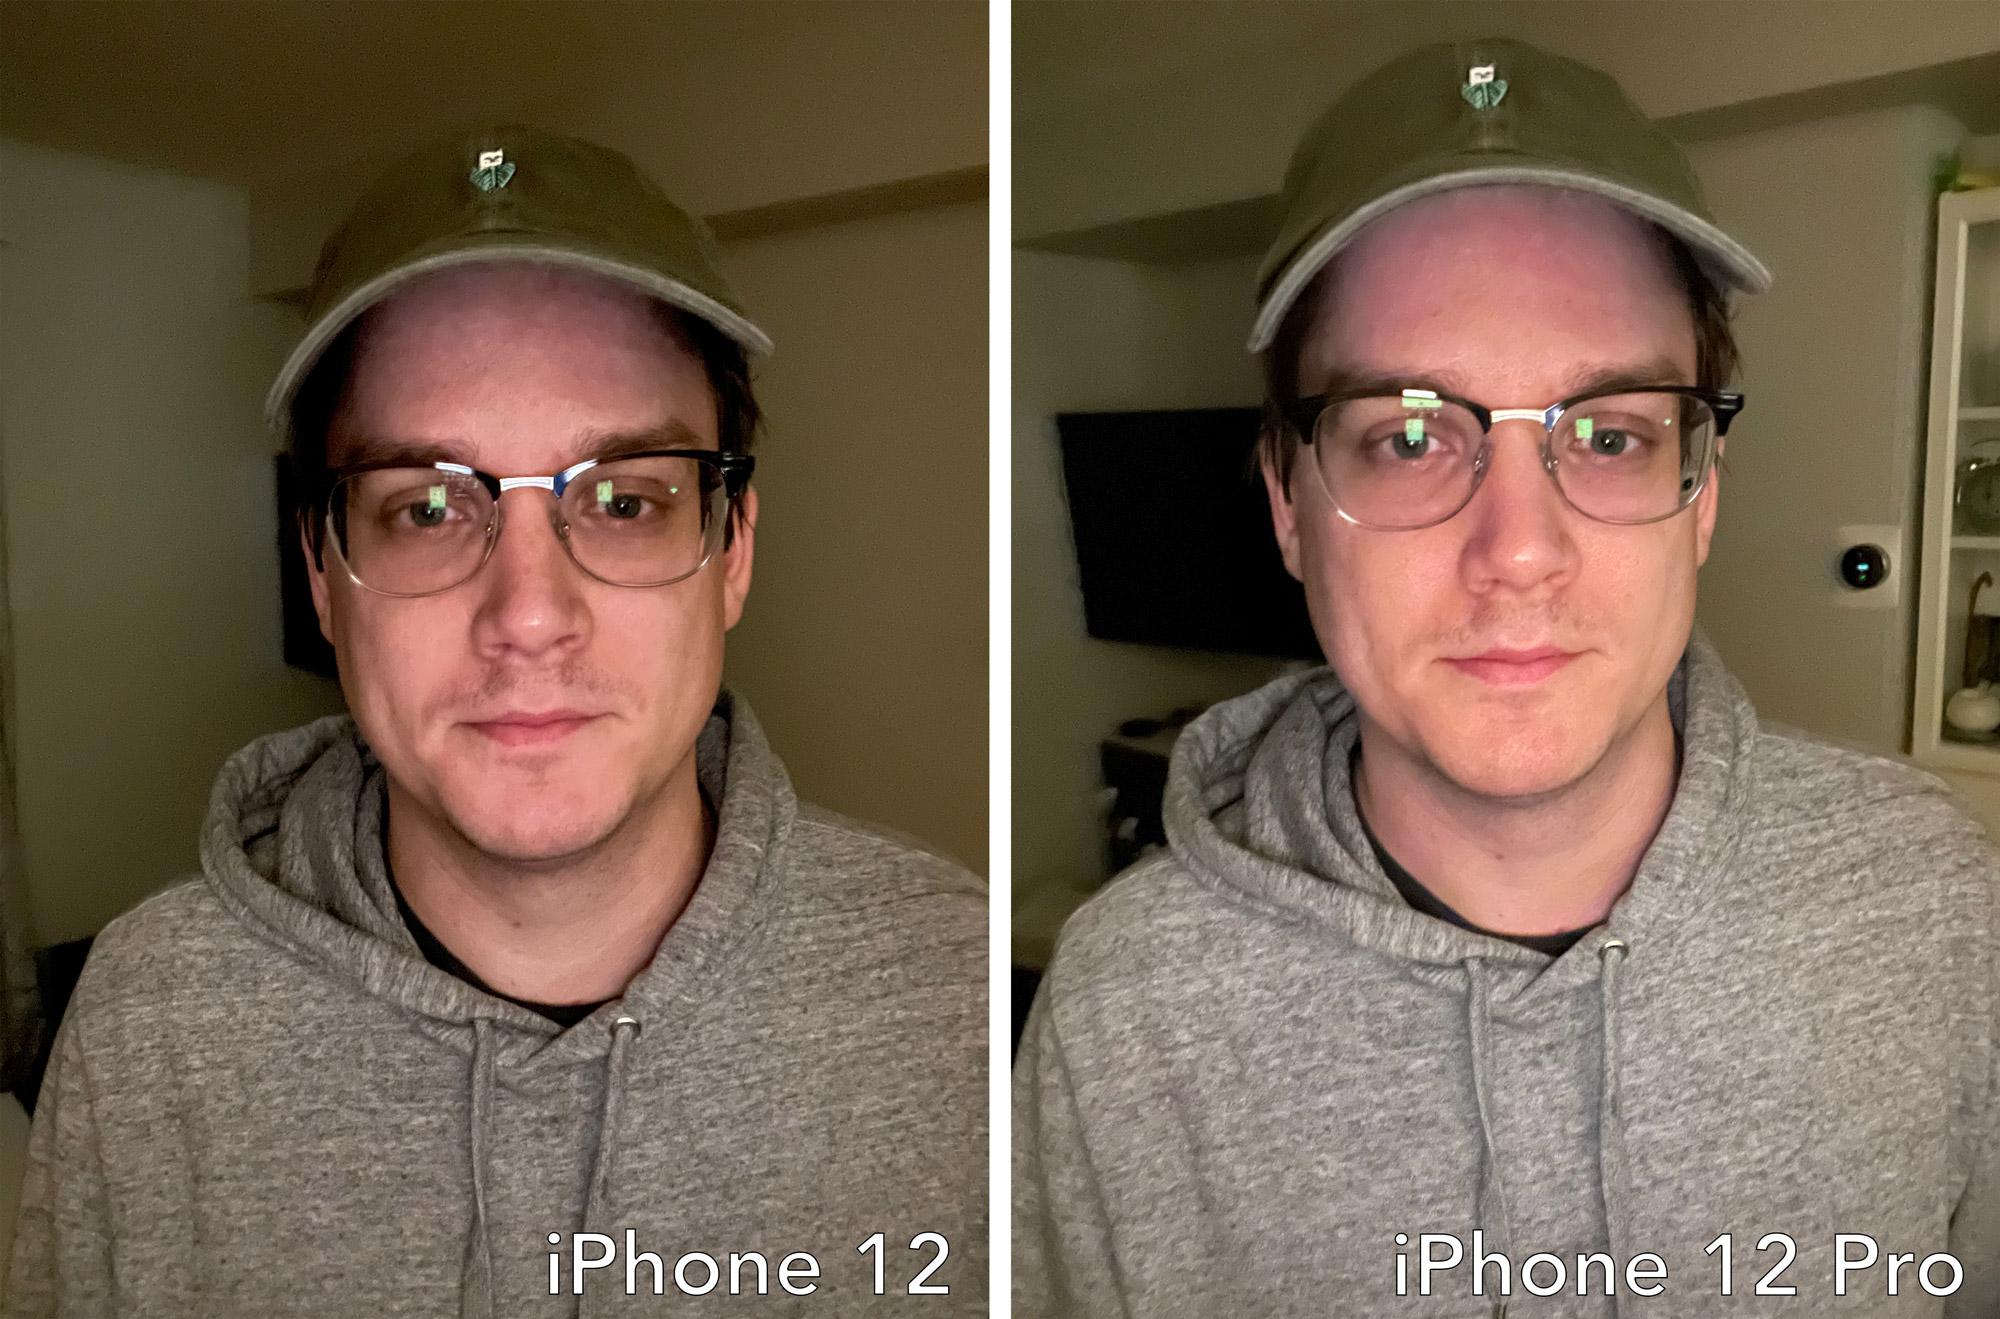 iPhone 12 selfie shooter comparison